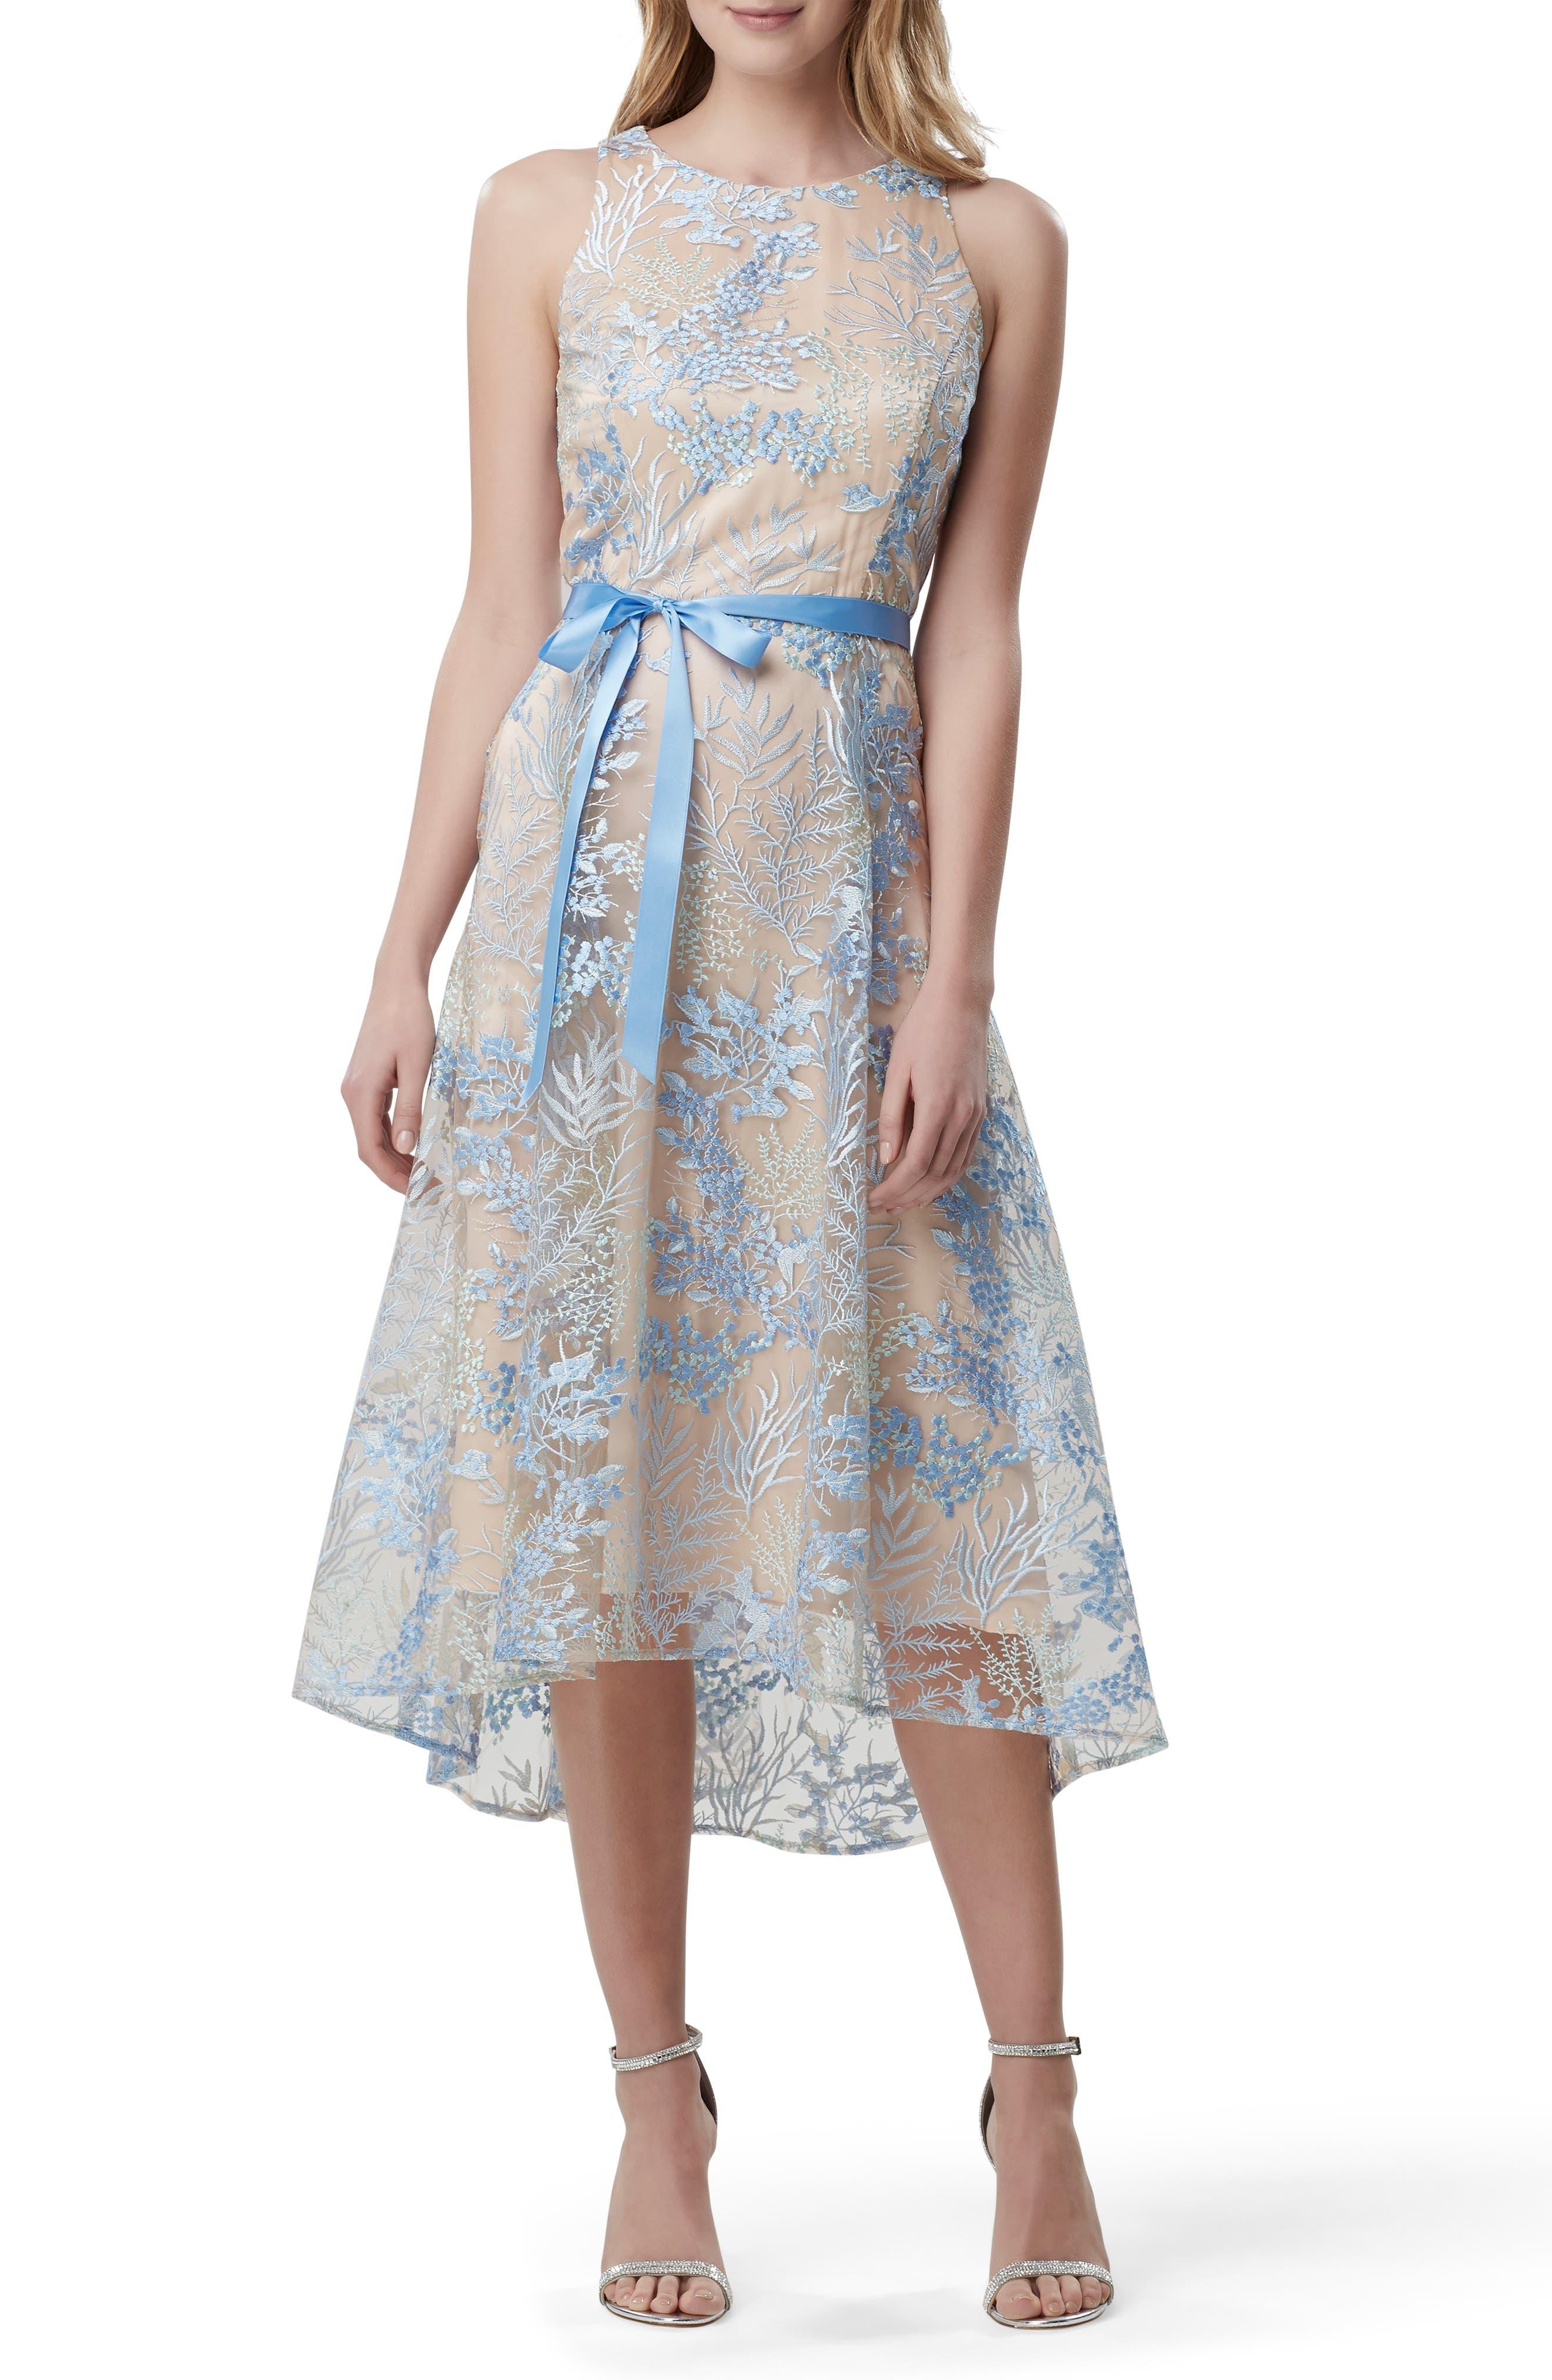 Tahari Embroidered Sleeveless High/low Midi Dress, Beige